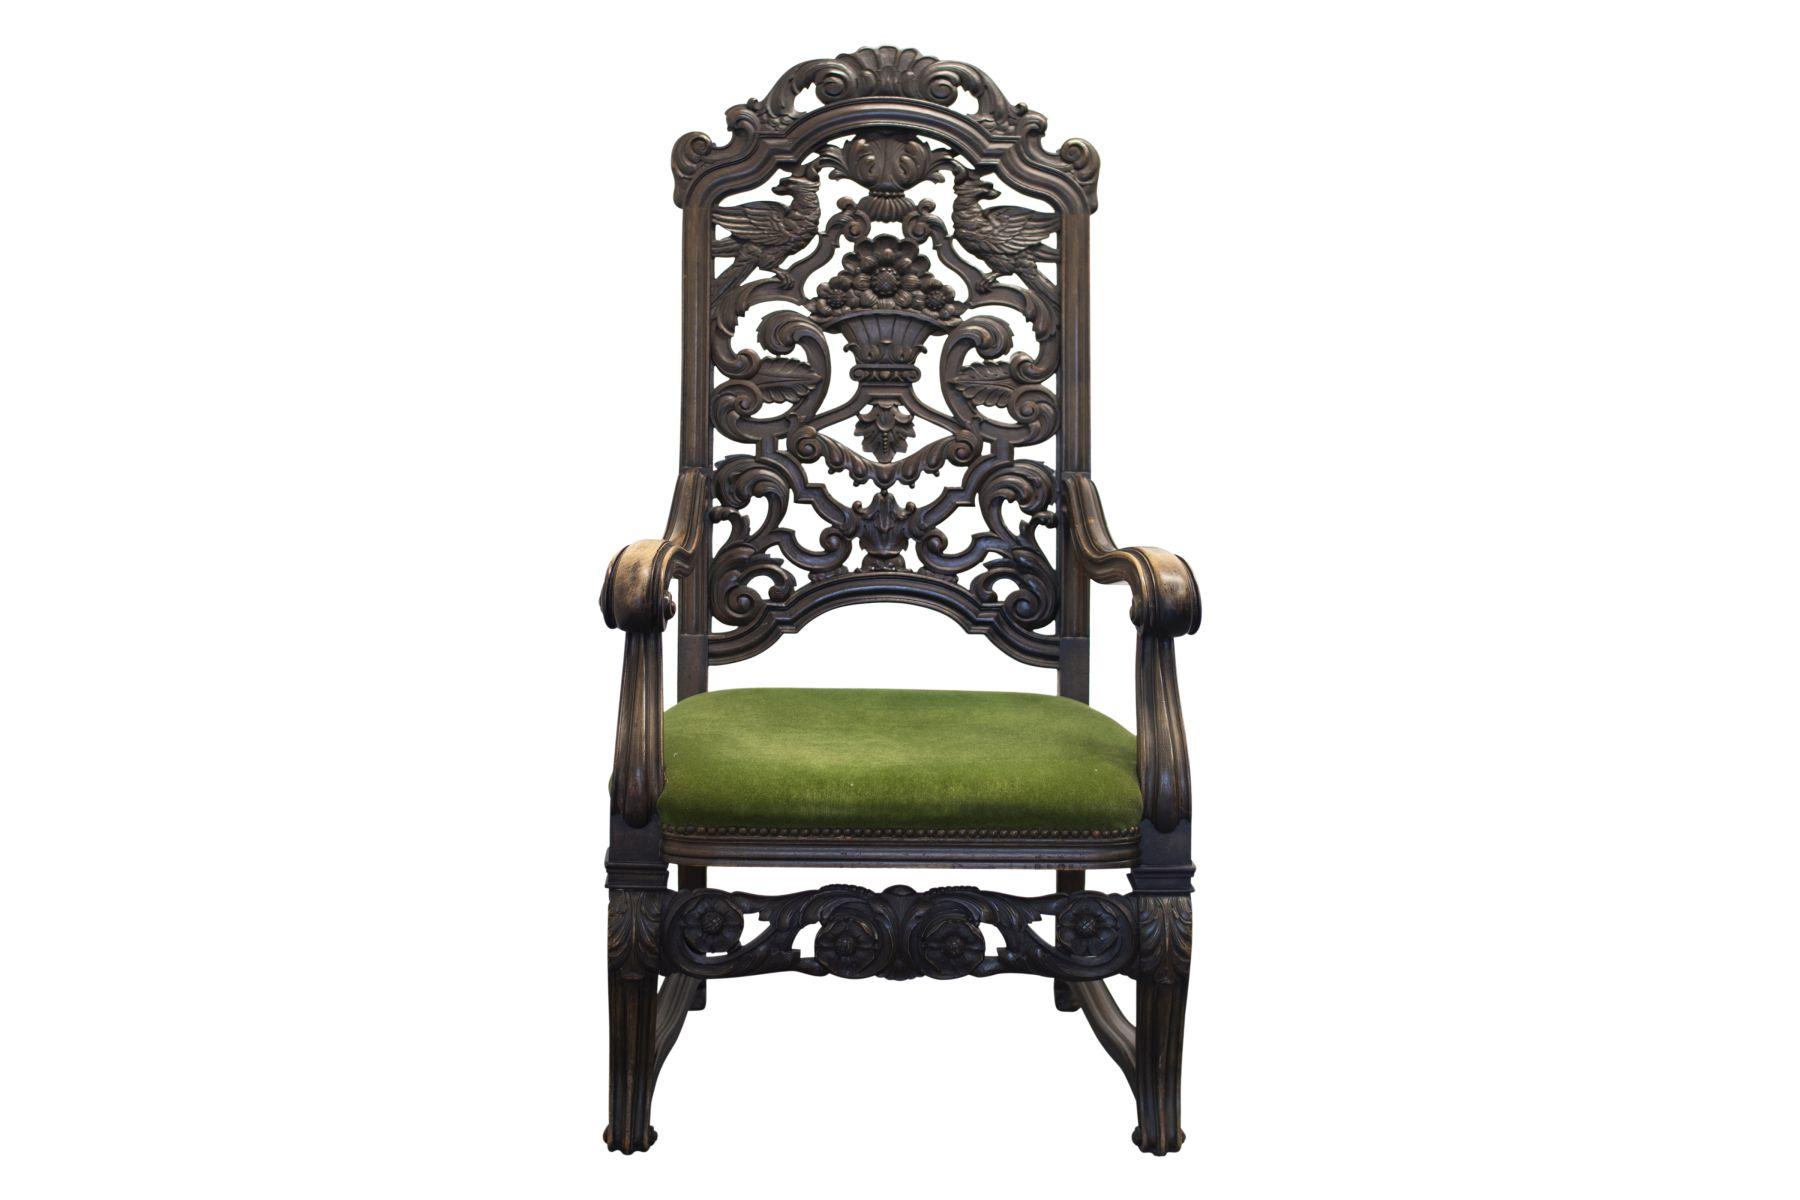 #27 Salon Armchair, Belle Epoque Style | Salon-Armlehnstuhl, Stil Belle Epoche Image